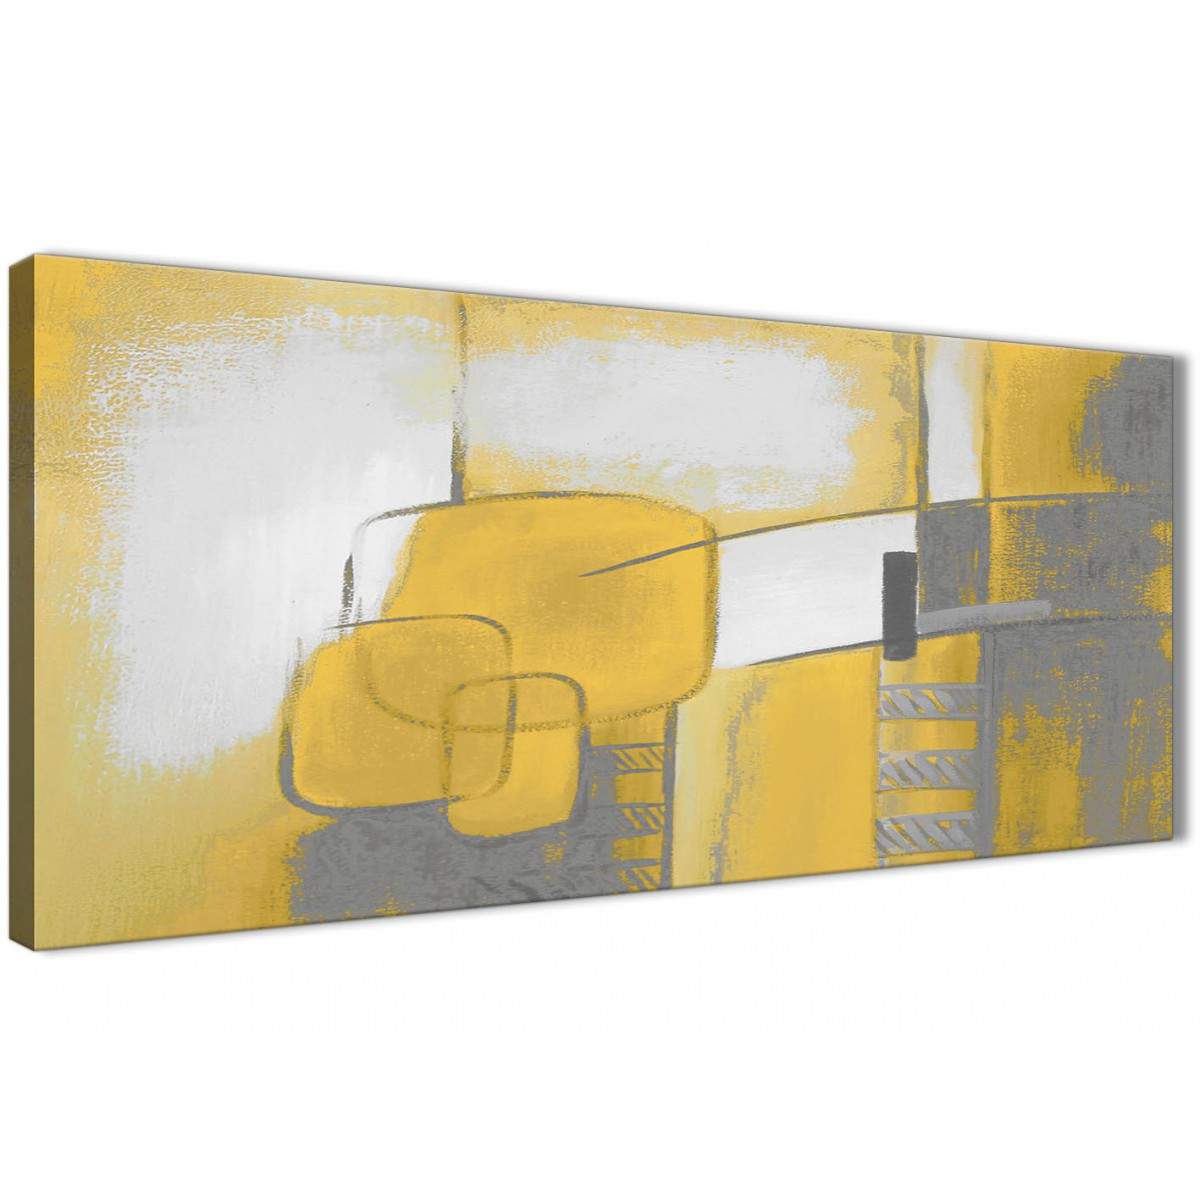 Bedroom Canvas Wall Art Uk: Mustard Yellow Grey Painting Bedroom Canvas Wall Art